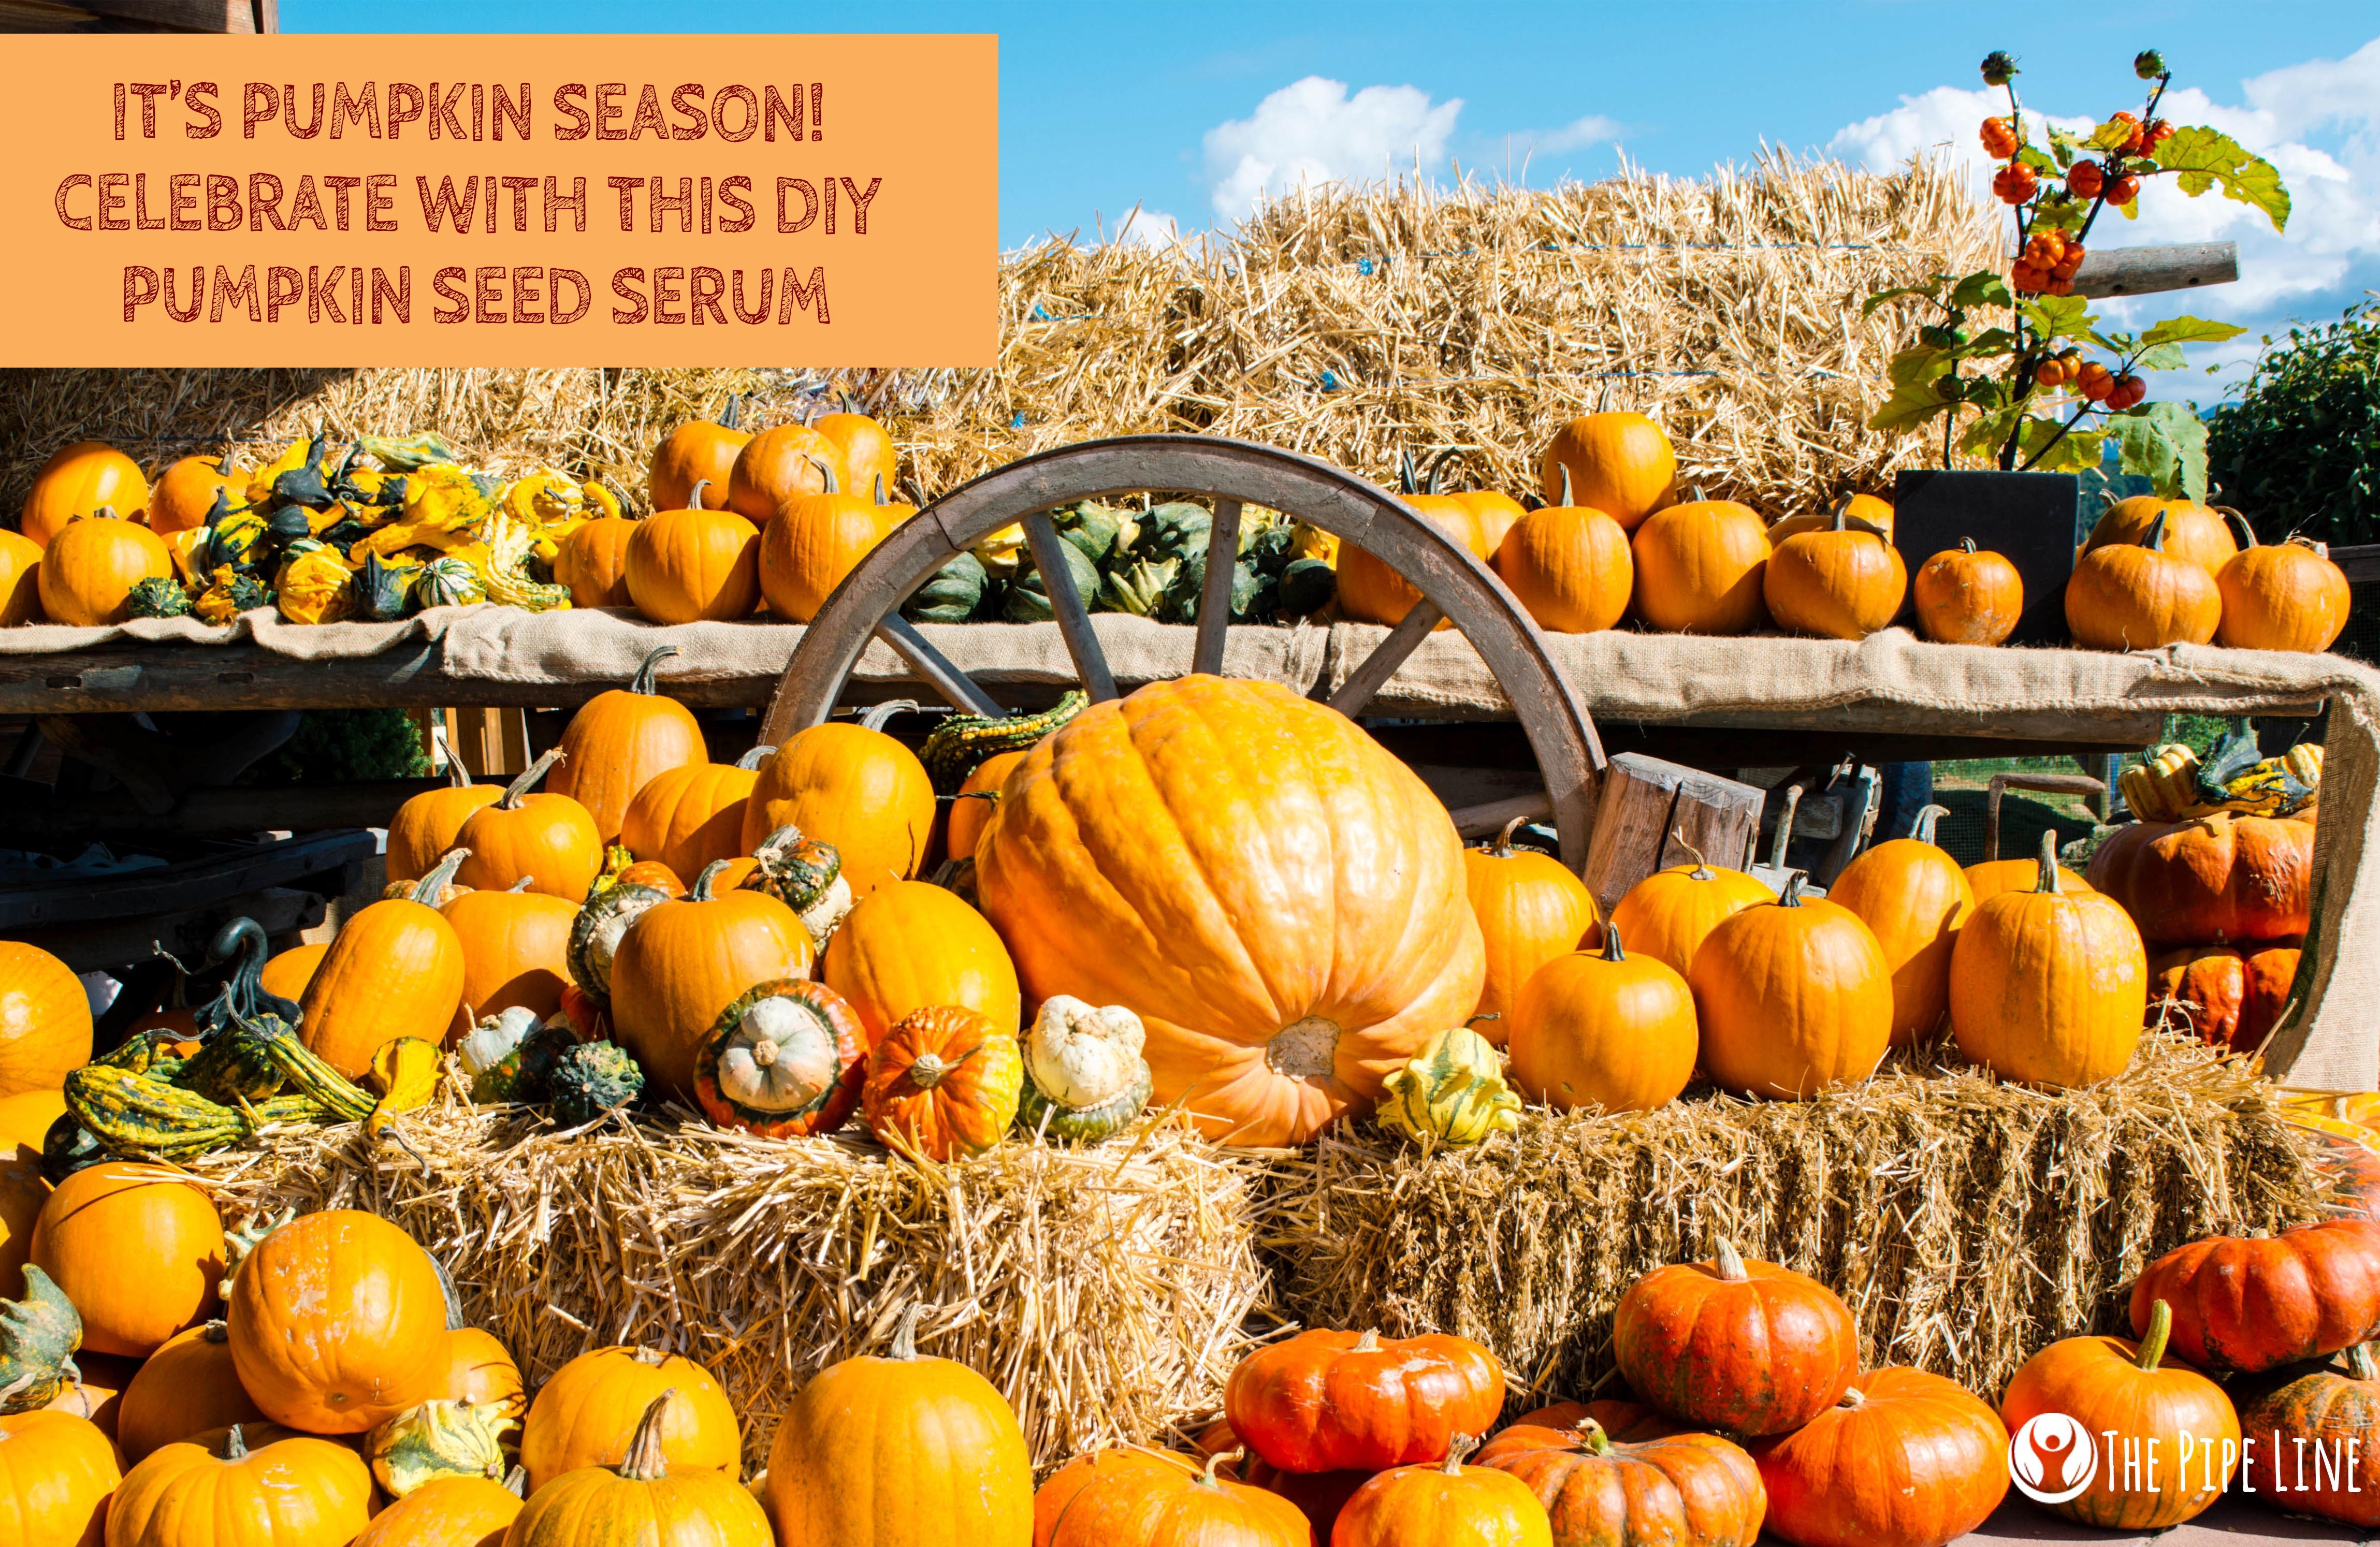 Pumpkin Seed Oil Benefits Prostate & Heart Health in 2020